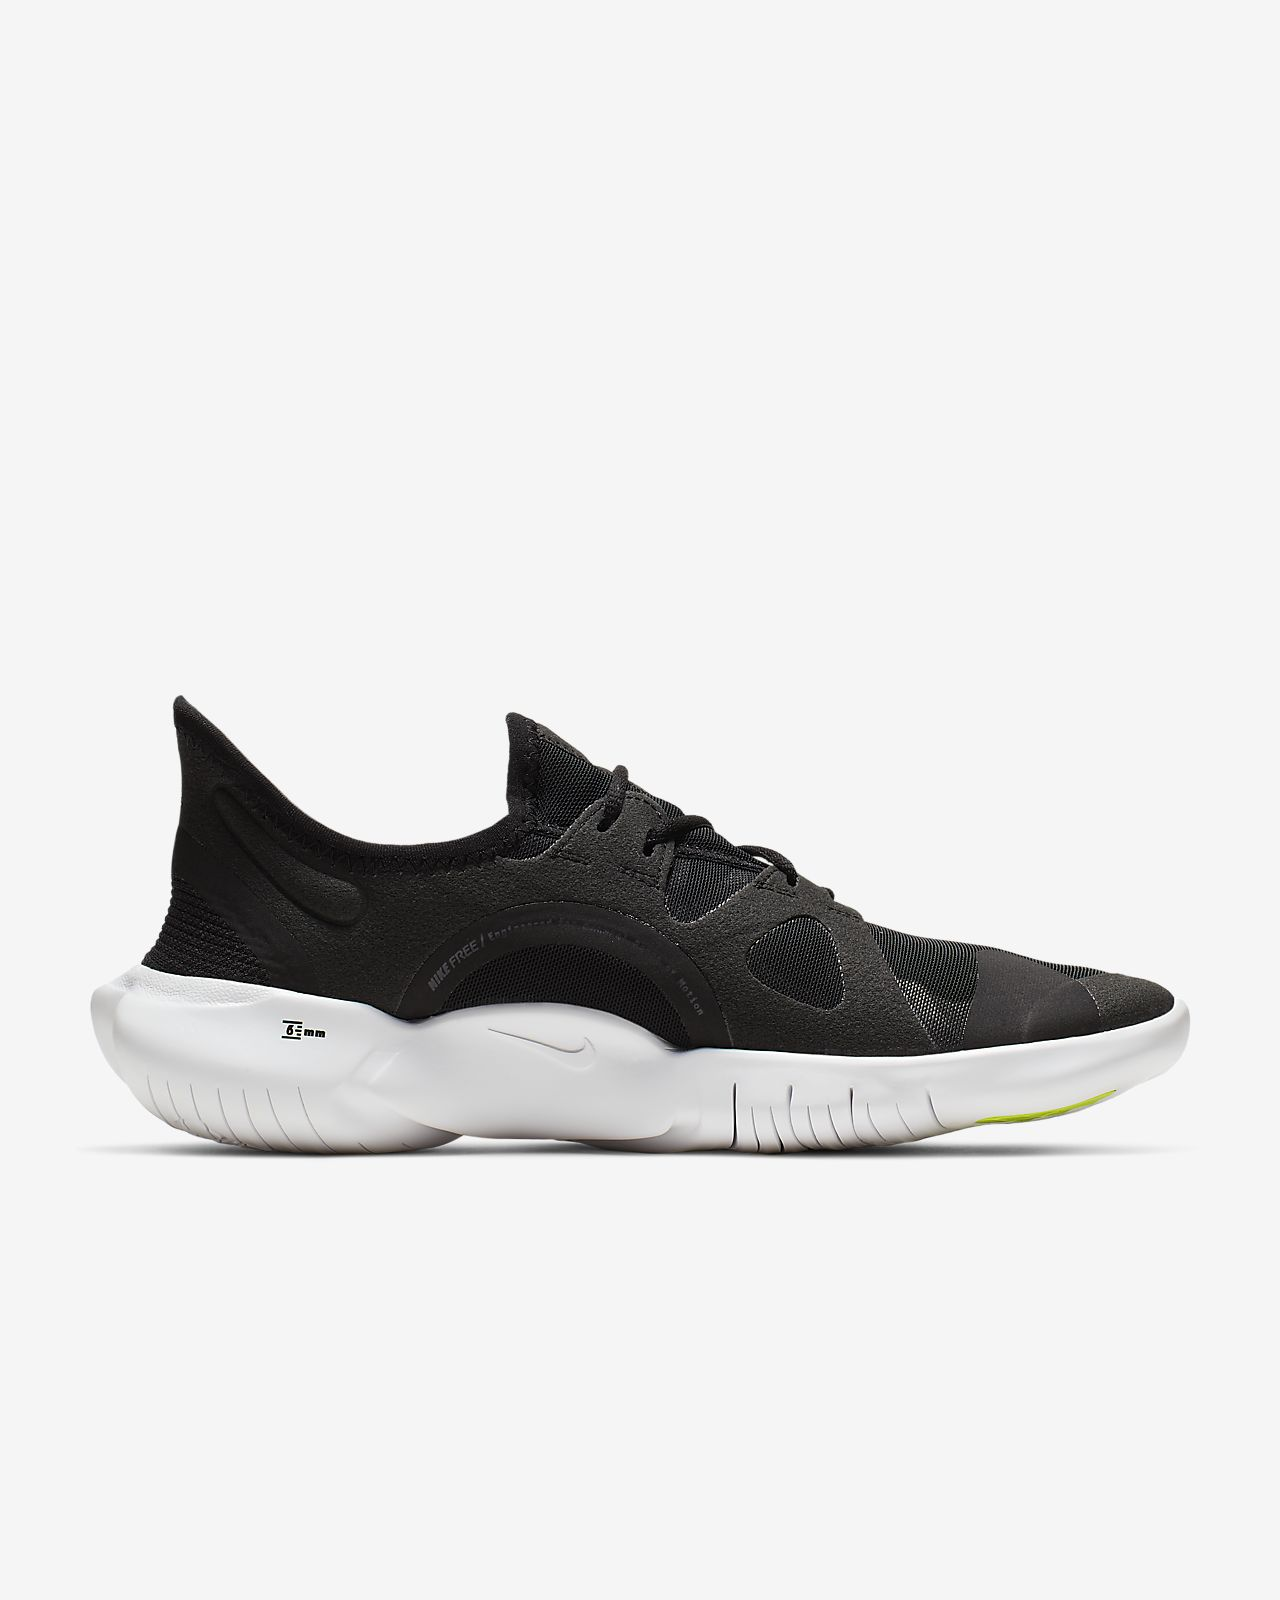 new arrival 12027 3cf5d Nike Free RN 5.0 Women's Running Shoe